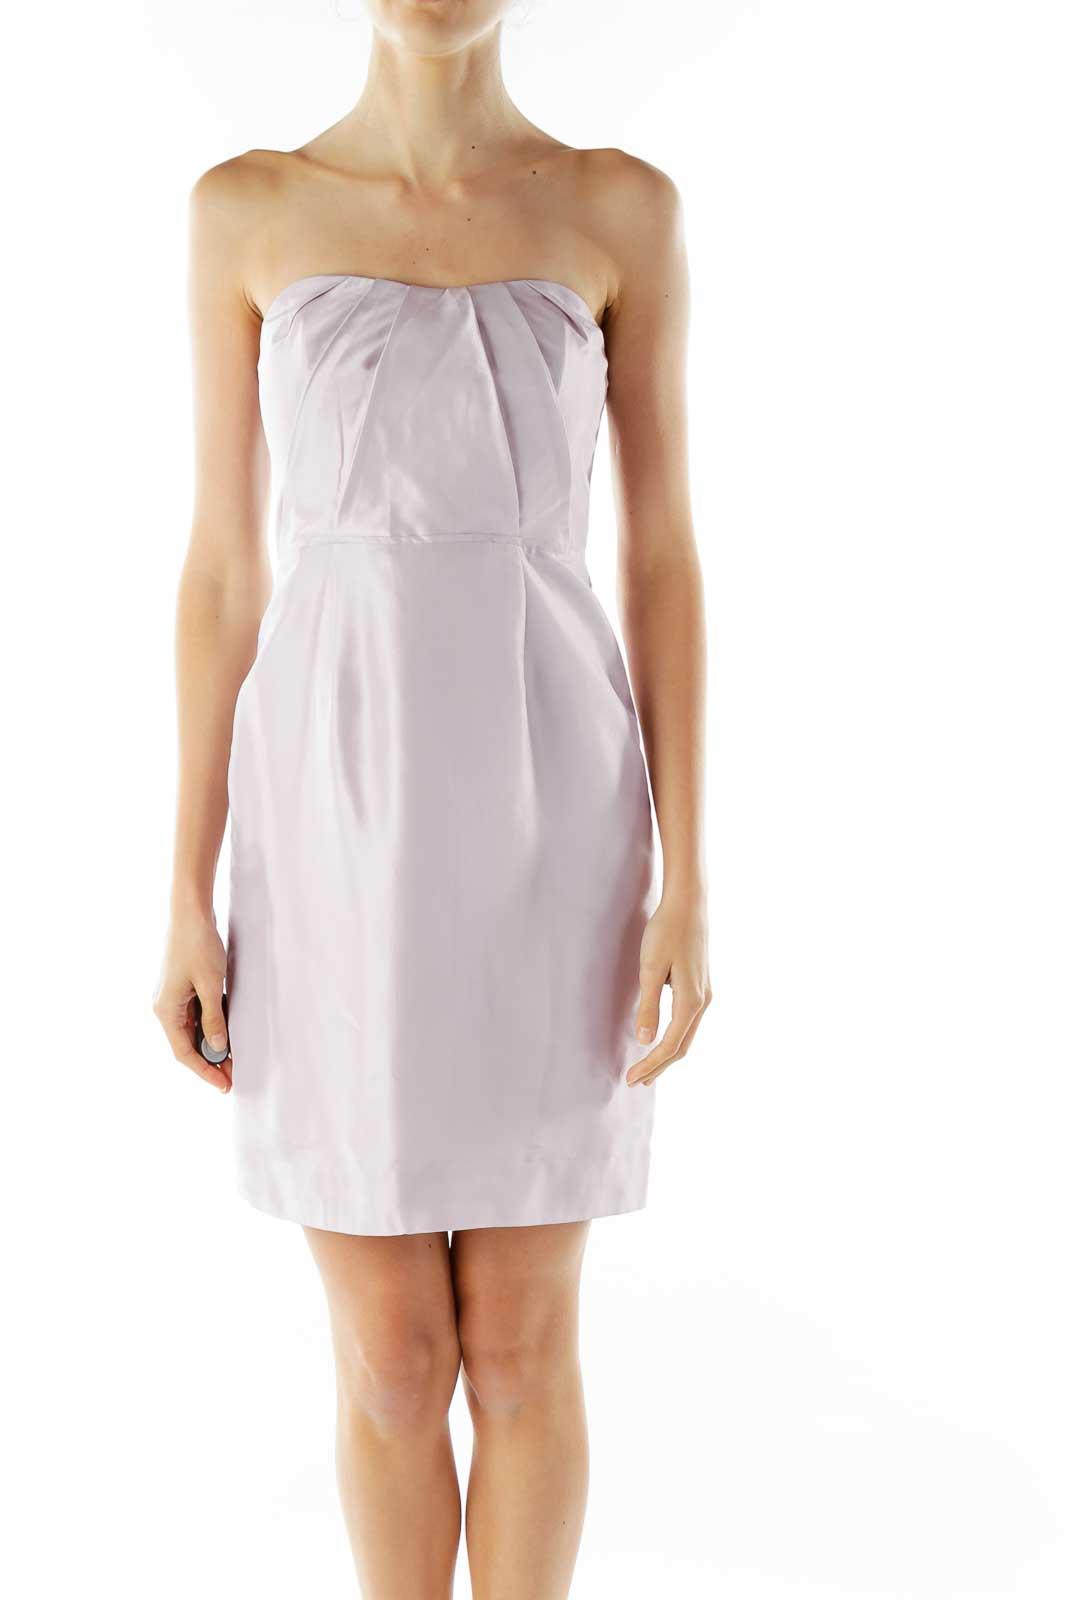 Mauve Strapless Cocktail Dress Front